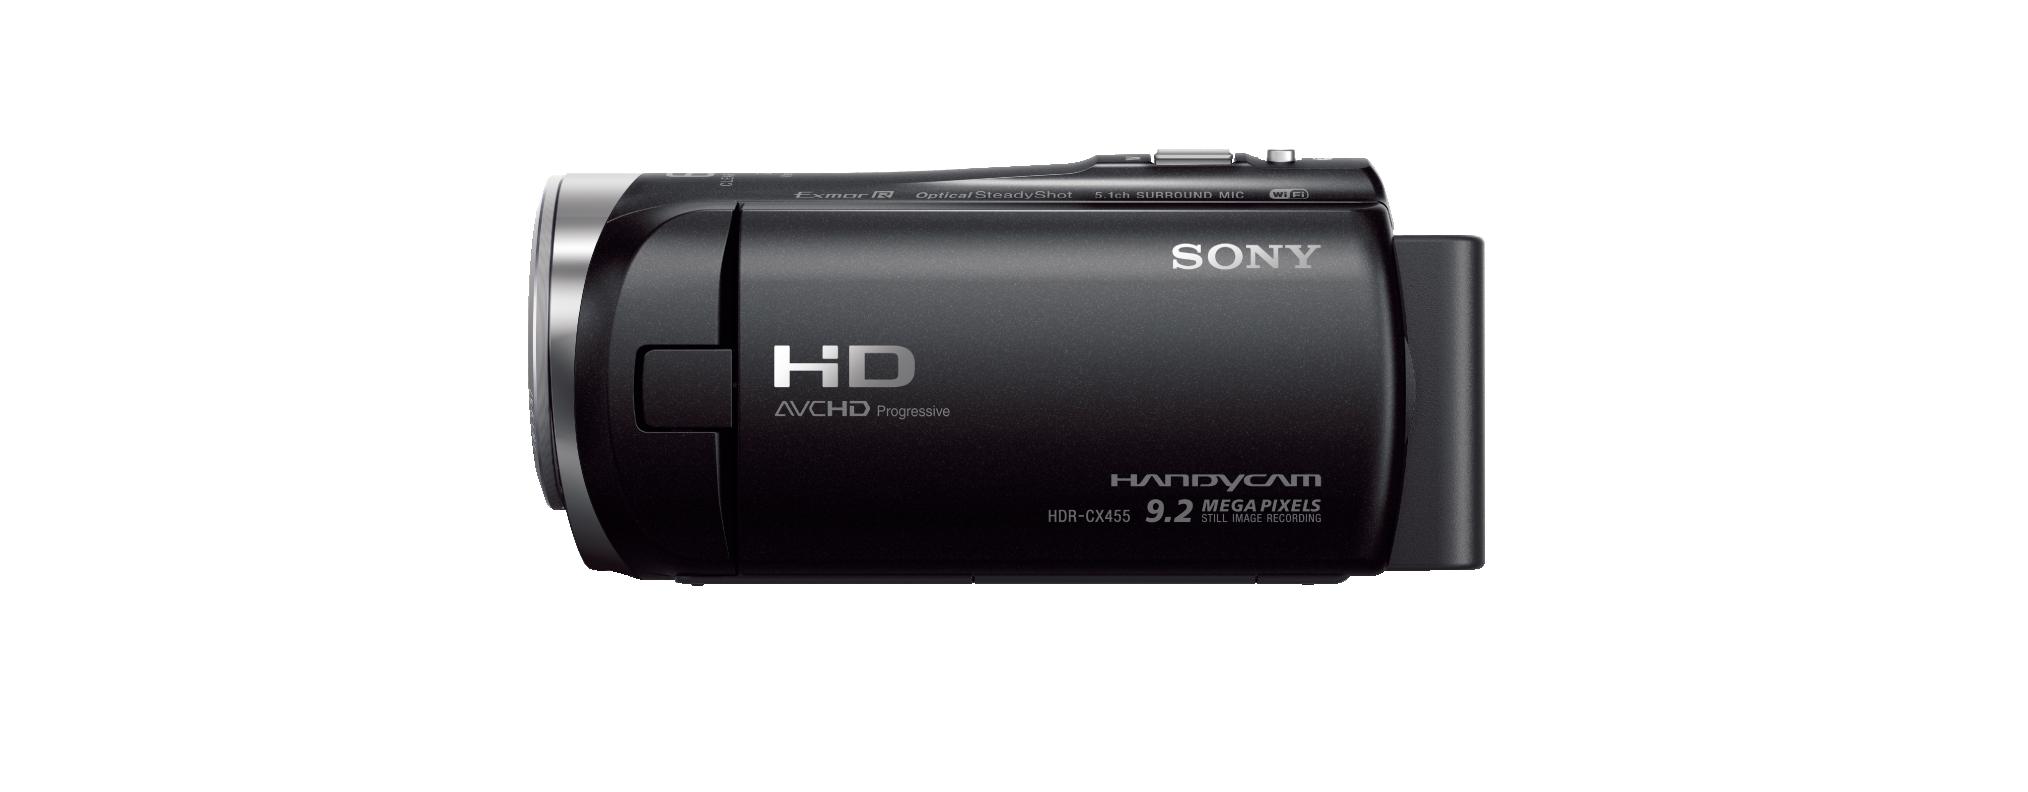 Digital video camera sony 12 megapixel инструкция